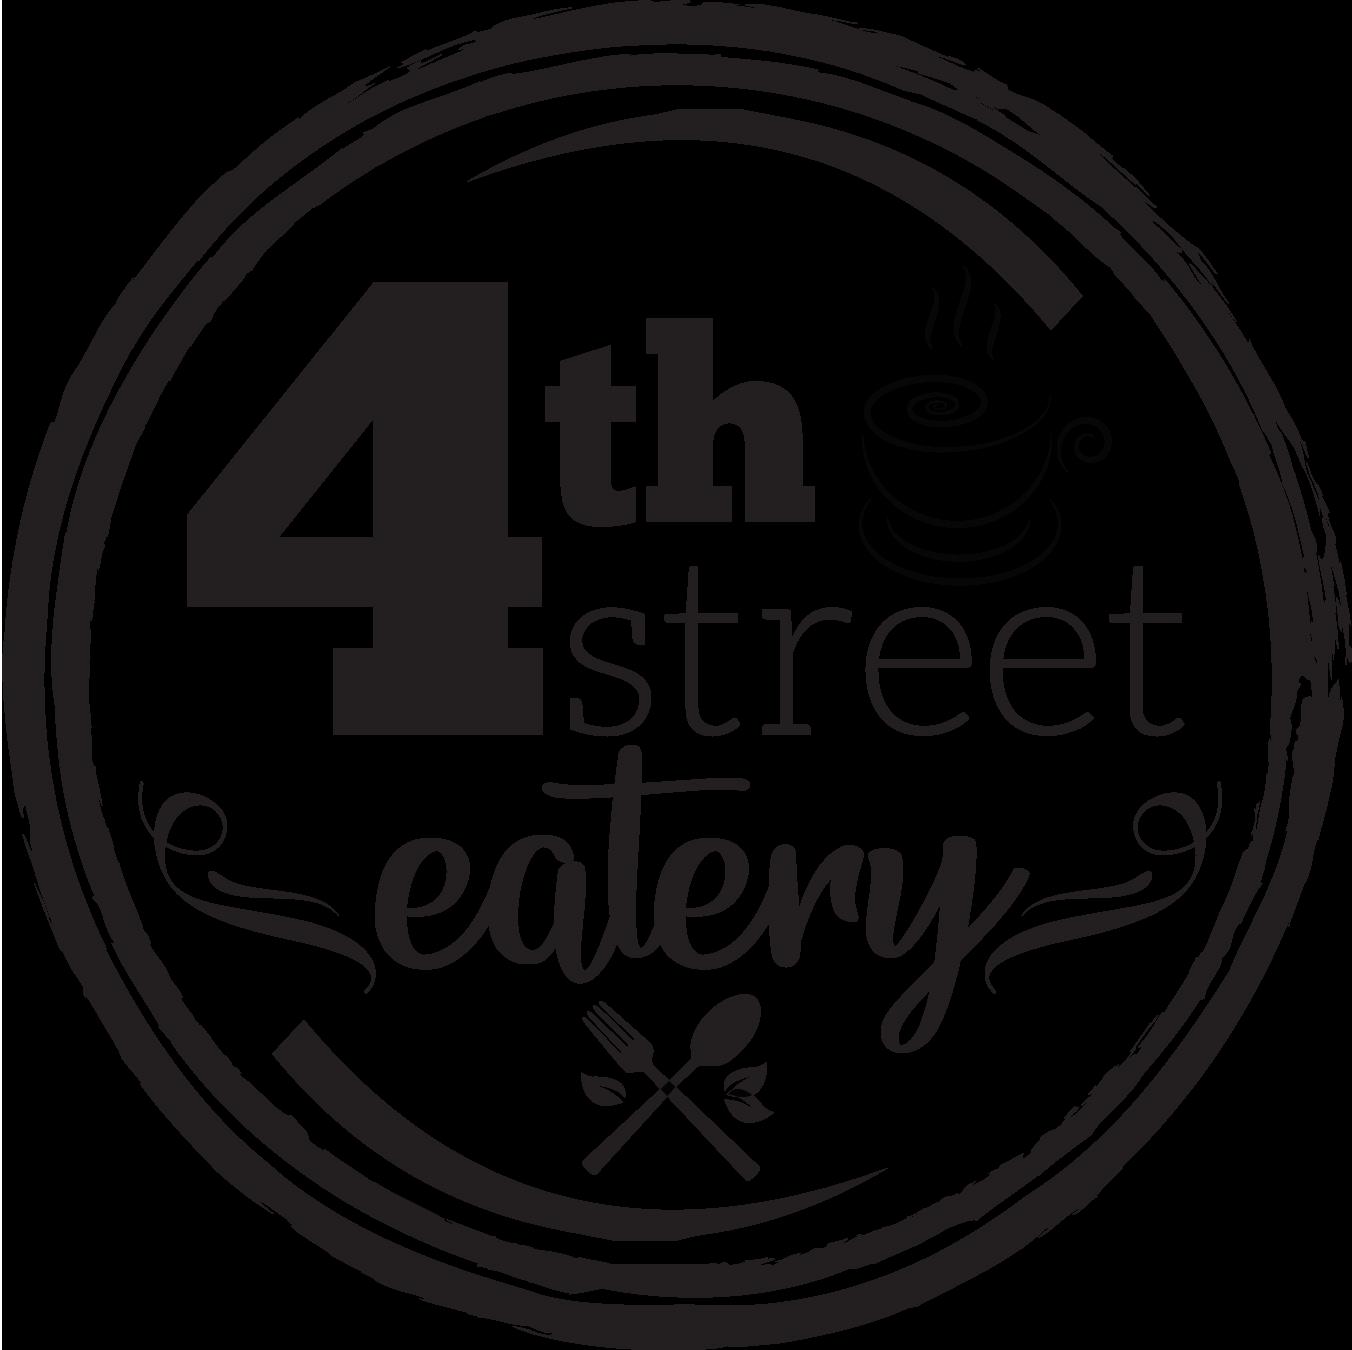 4th Street Eatery